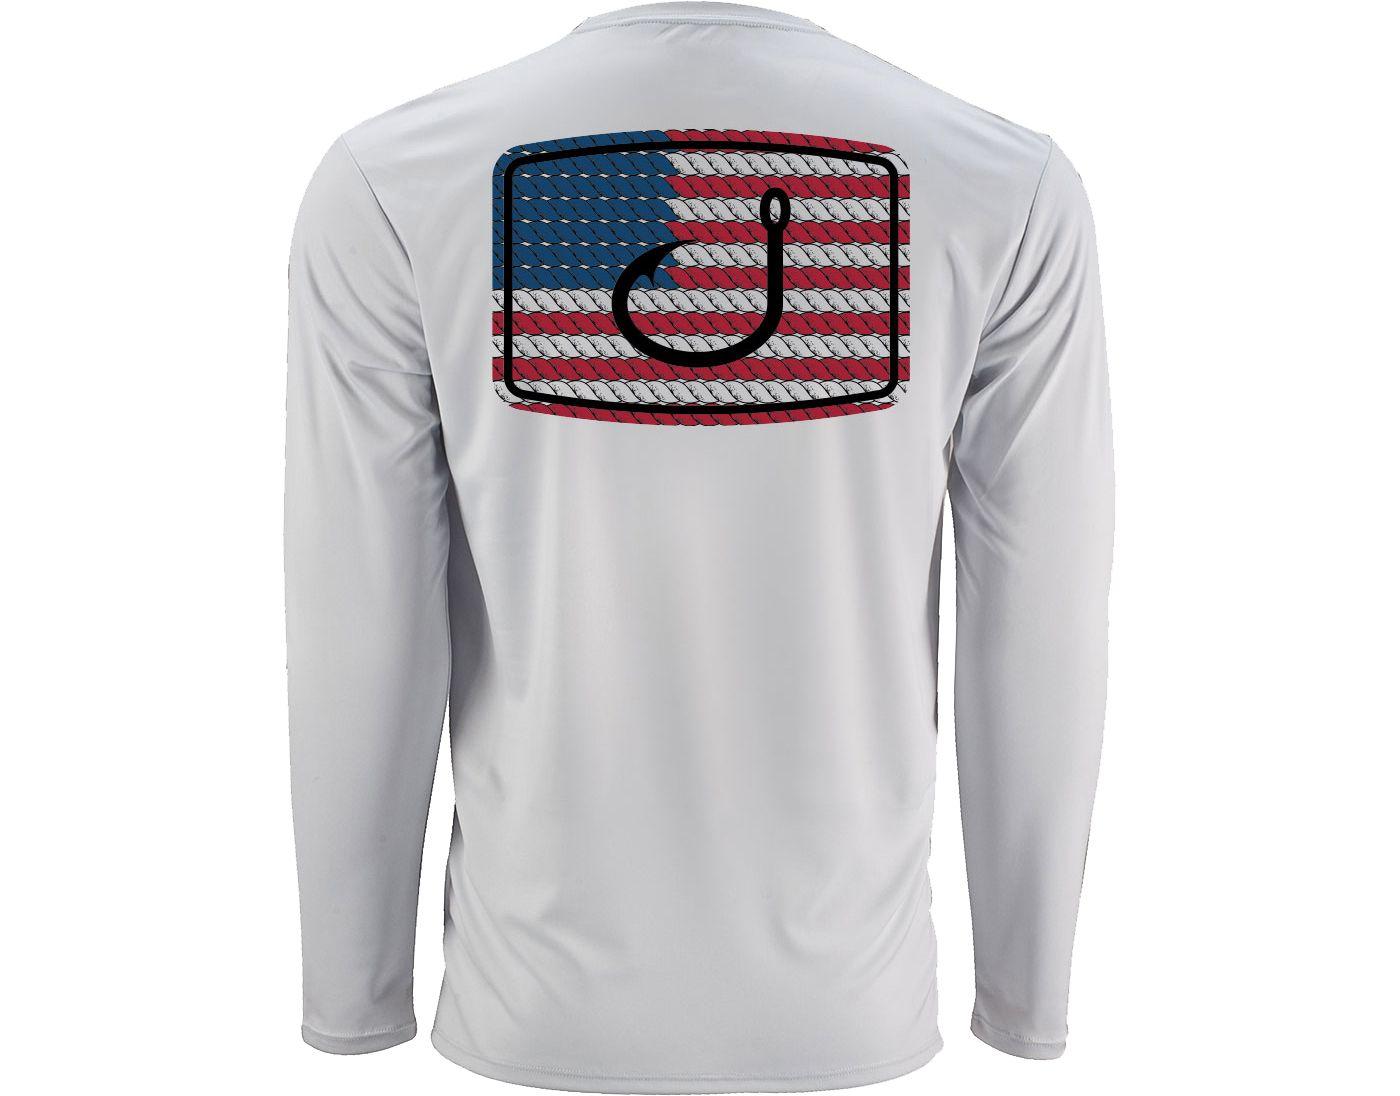 AVID Men's American Anthem AVIDry Long Sleeve Performance Shirt